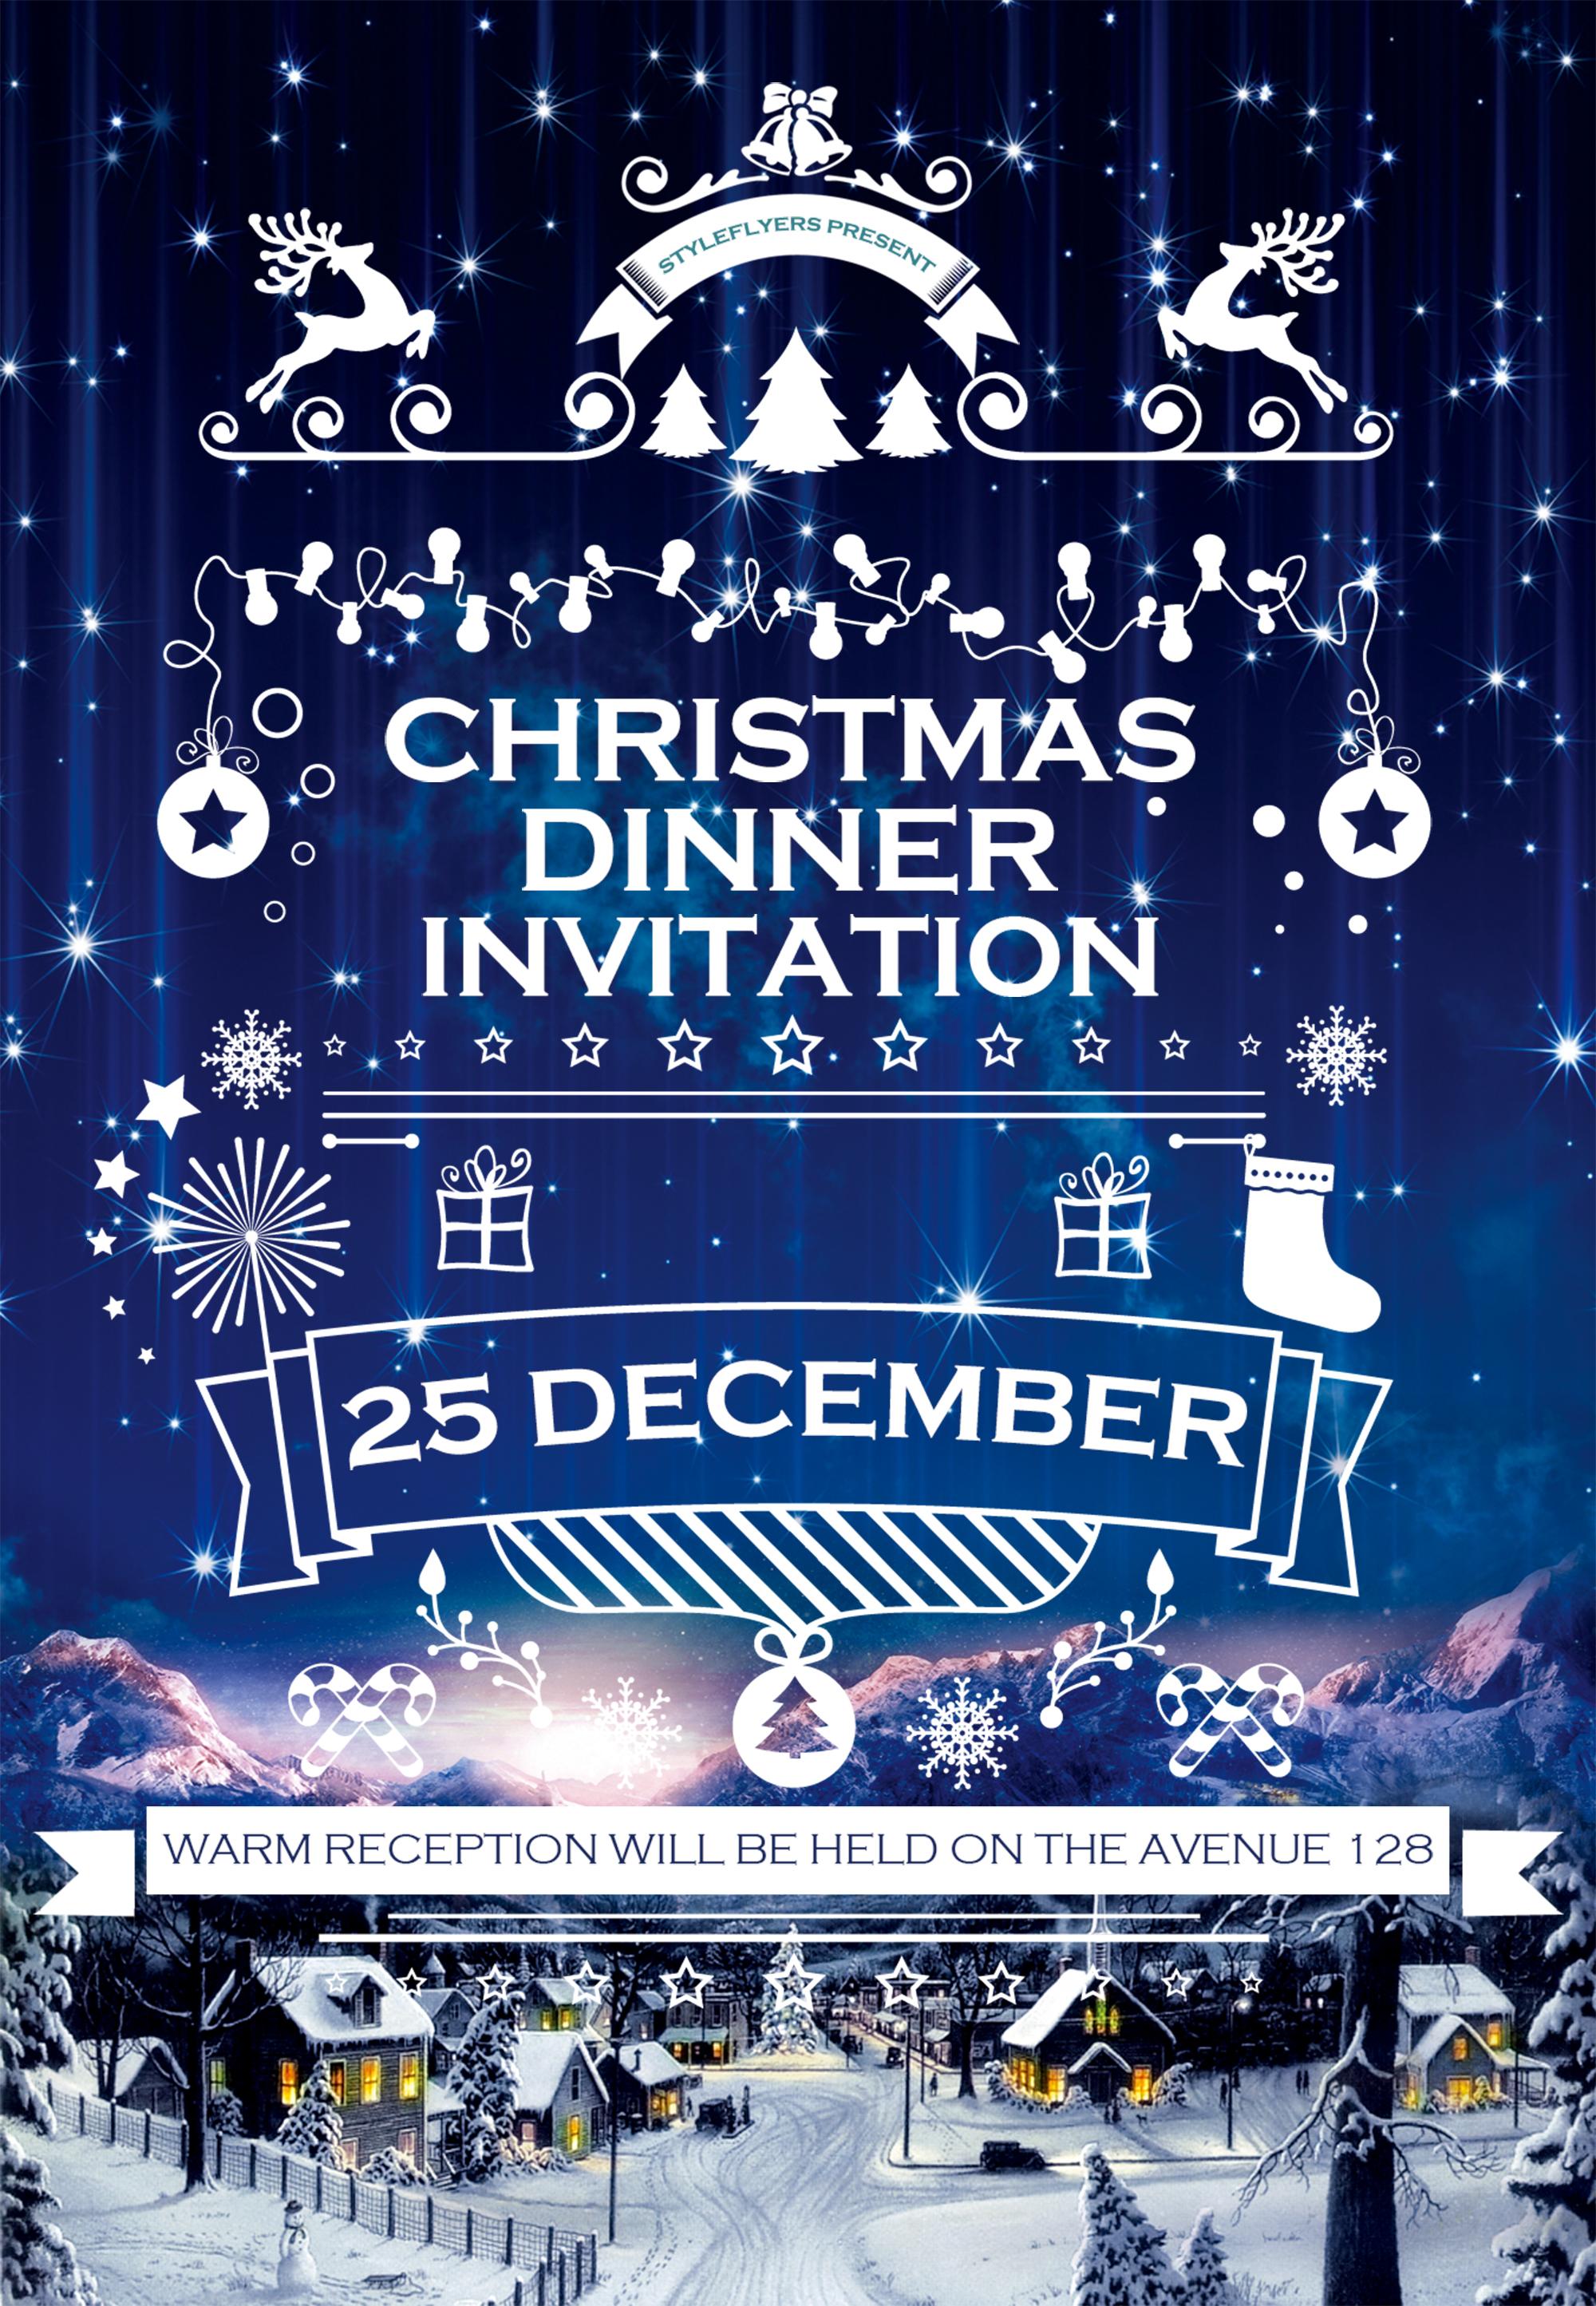 christmas dinner invitation poster template psd background